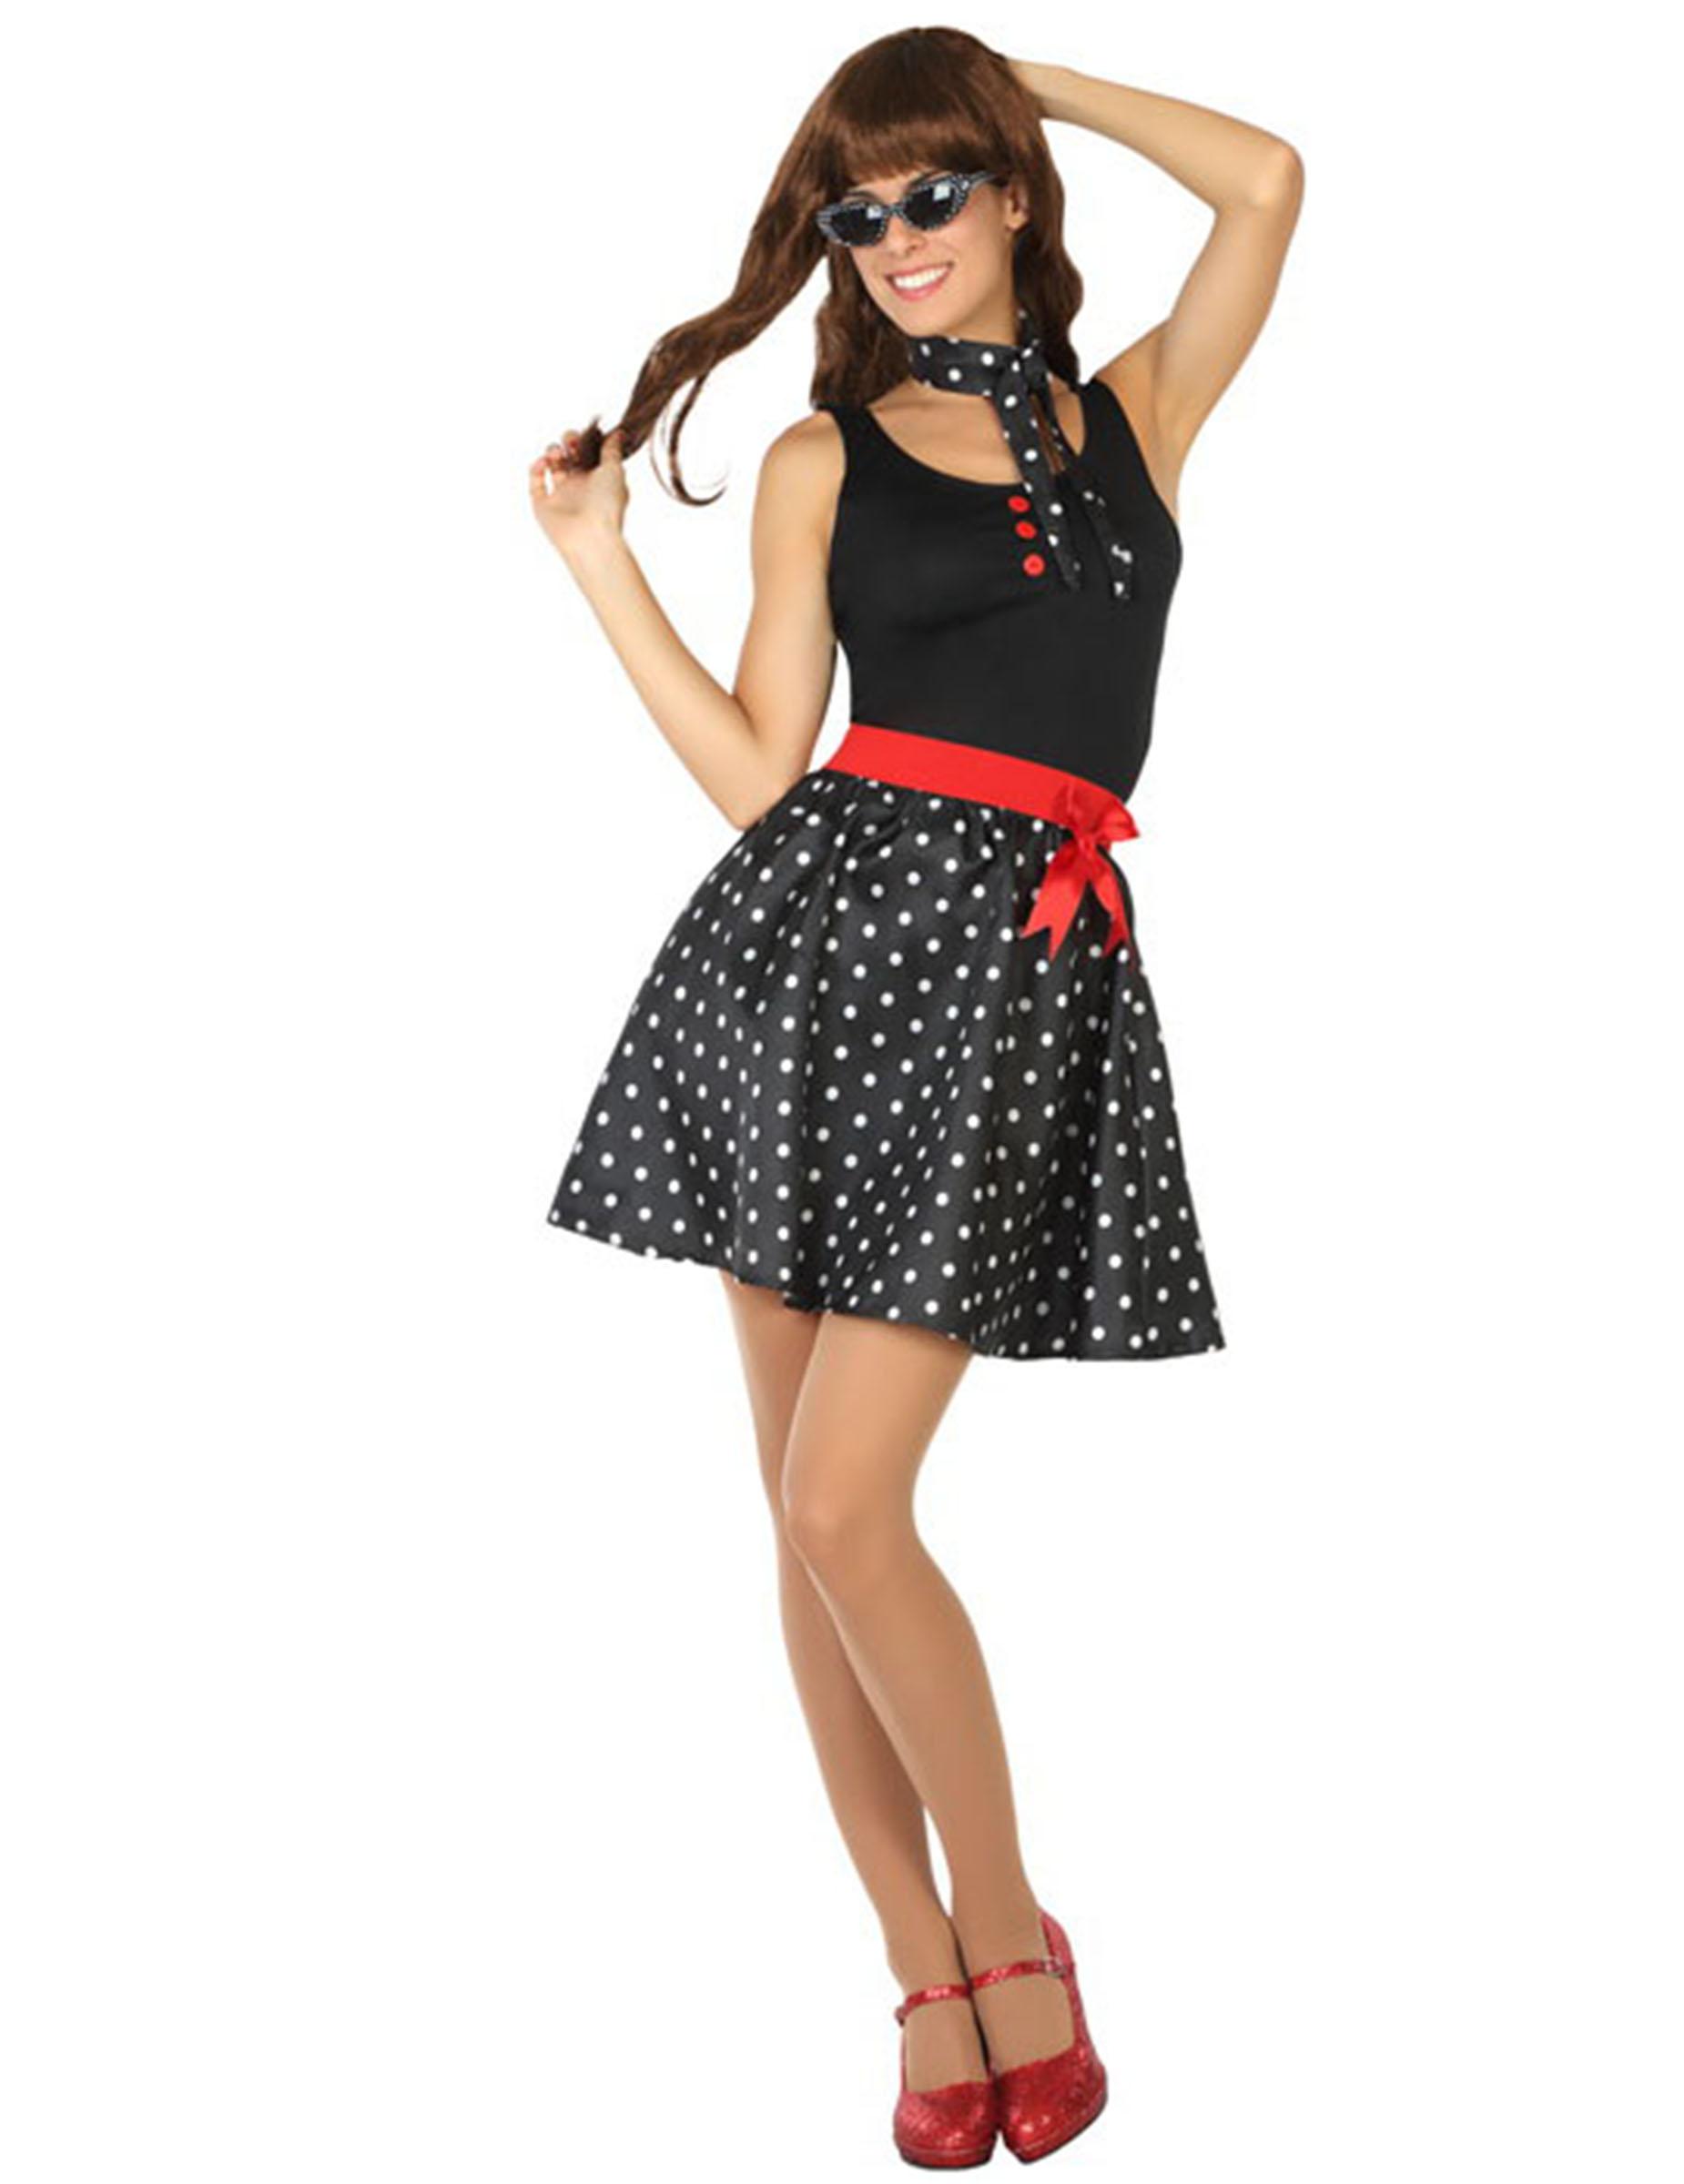 0eb1ae7d72a Déguisement robe années 50 noire   Deguise-toi